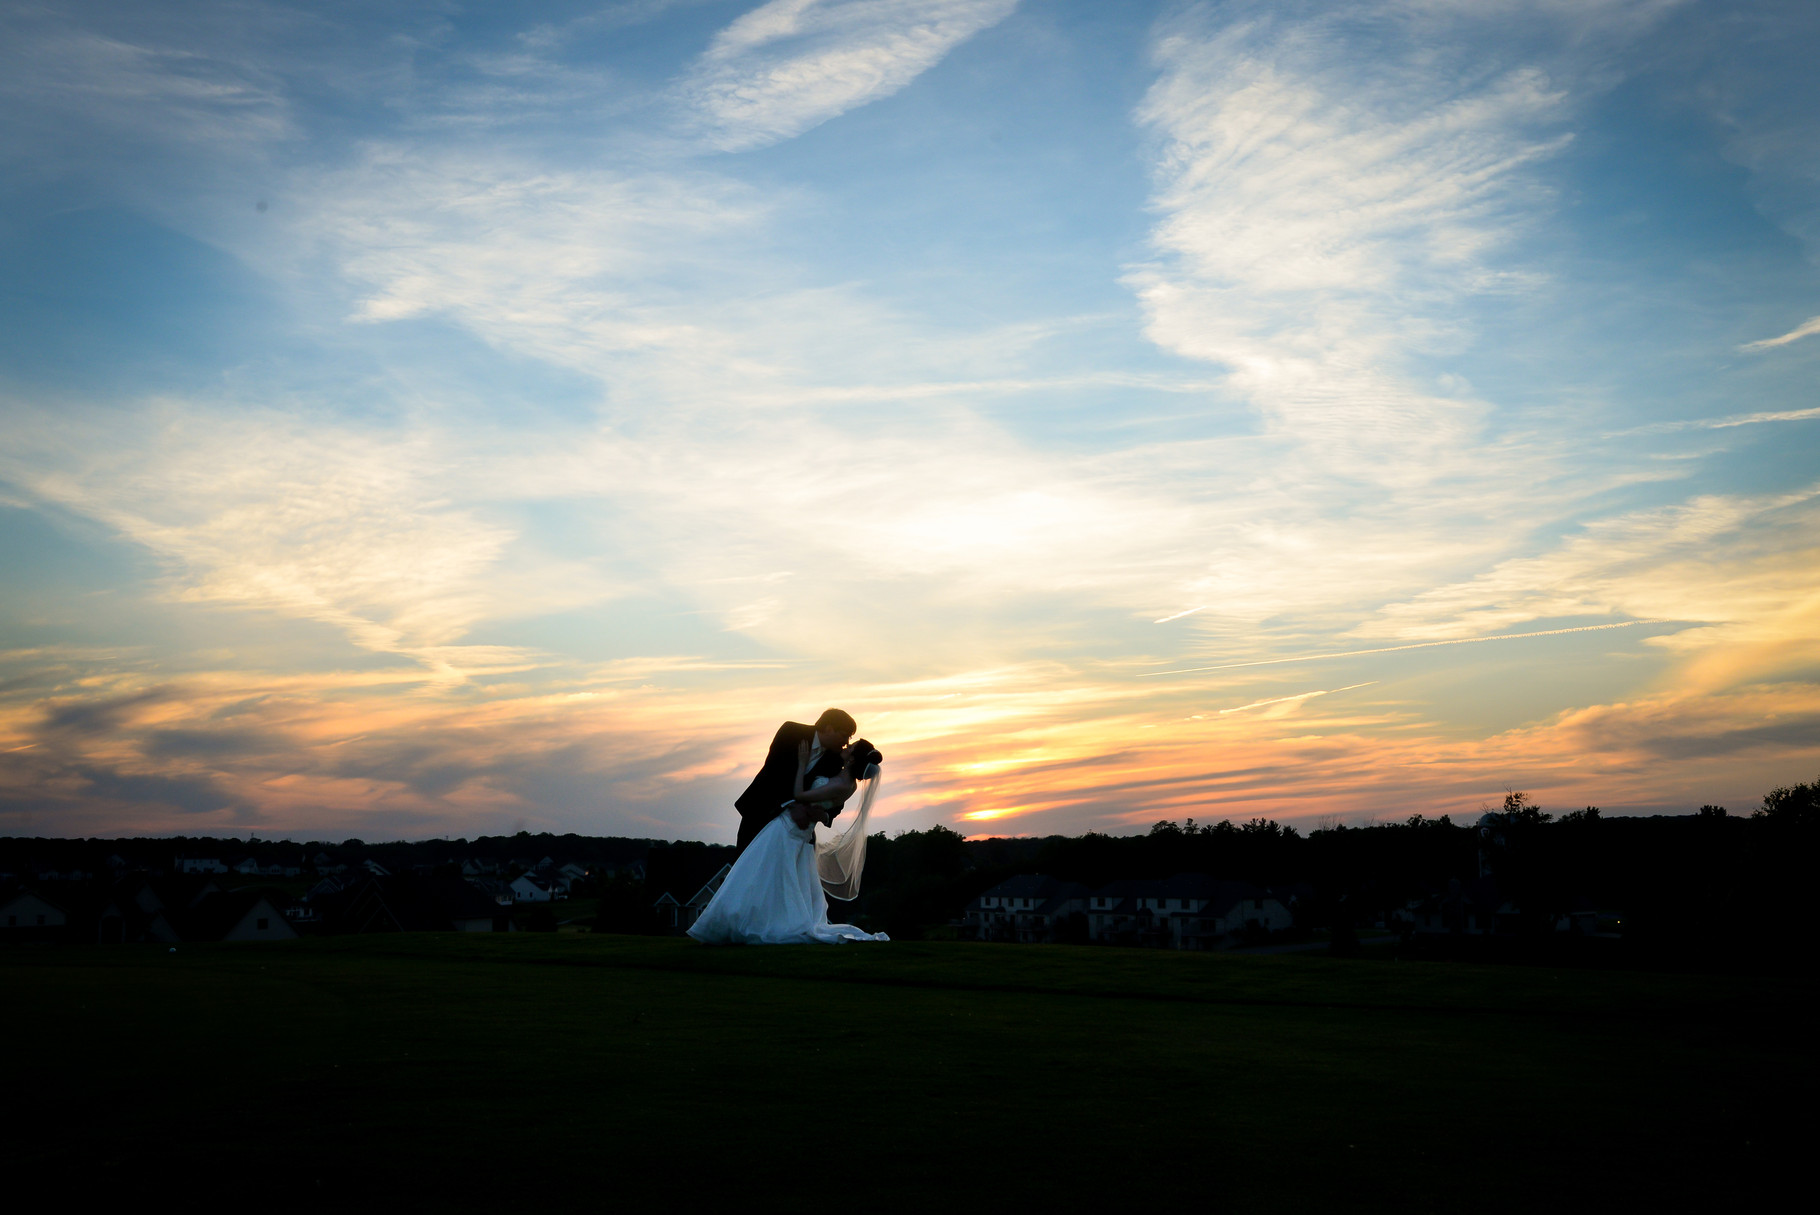 Mollie and Dan's sunset portrait. Wedding portrait in Poland, Ohio